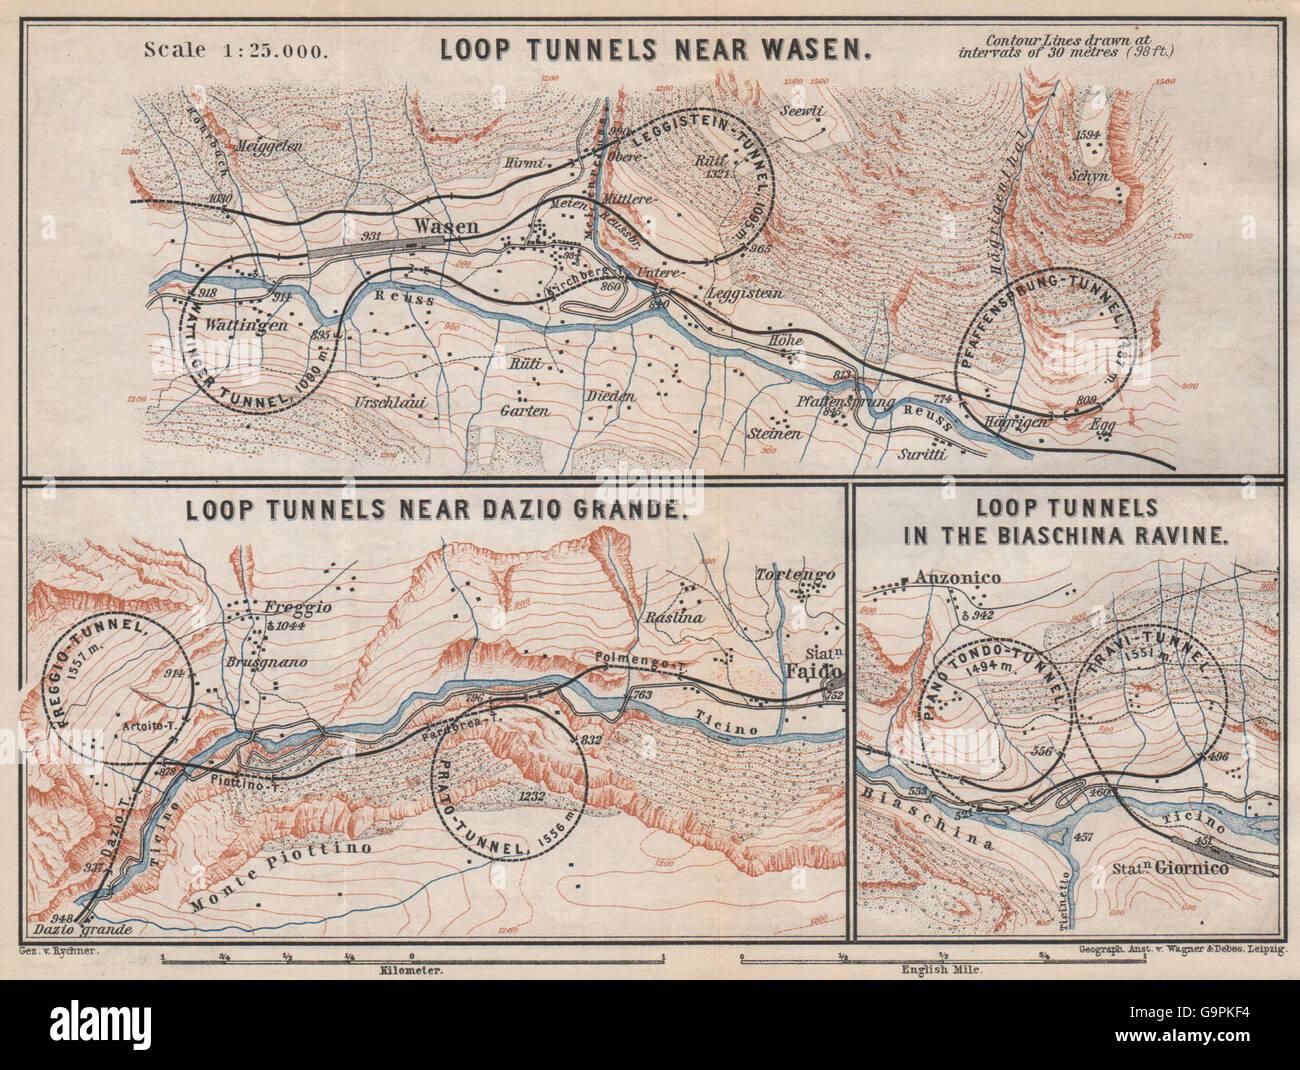 San Gotardo/bucle espiral túneles ferroviarios Wassen Freggio Prato Biaschina, 1889 mapa Foto de stock